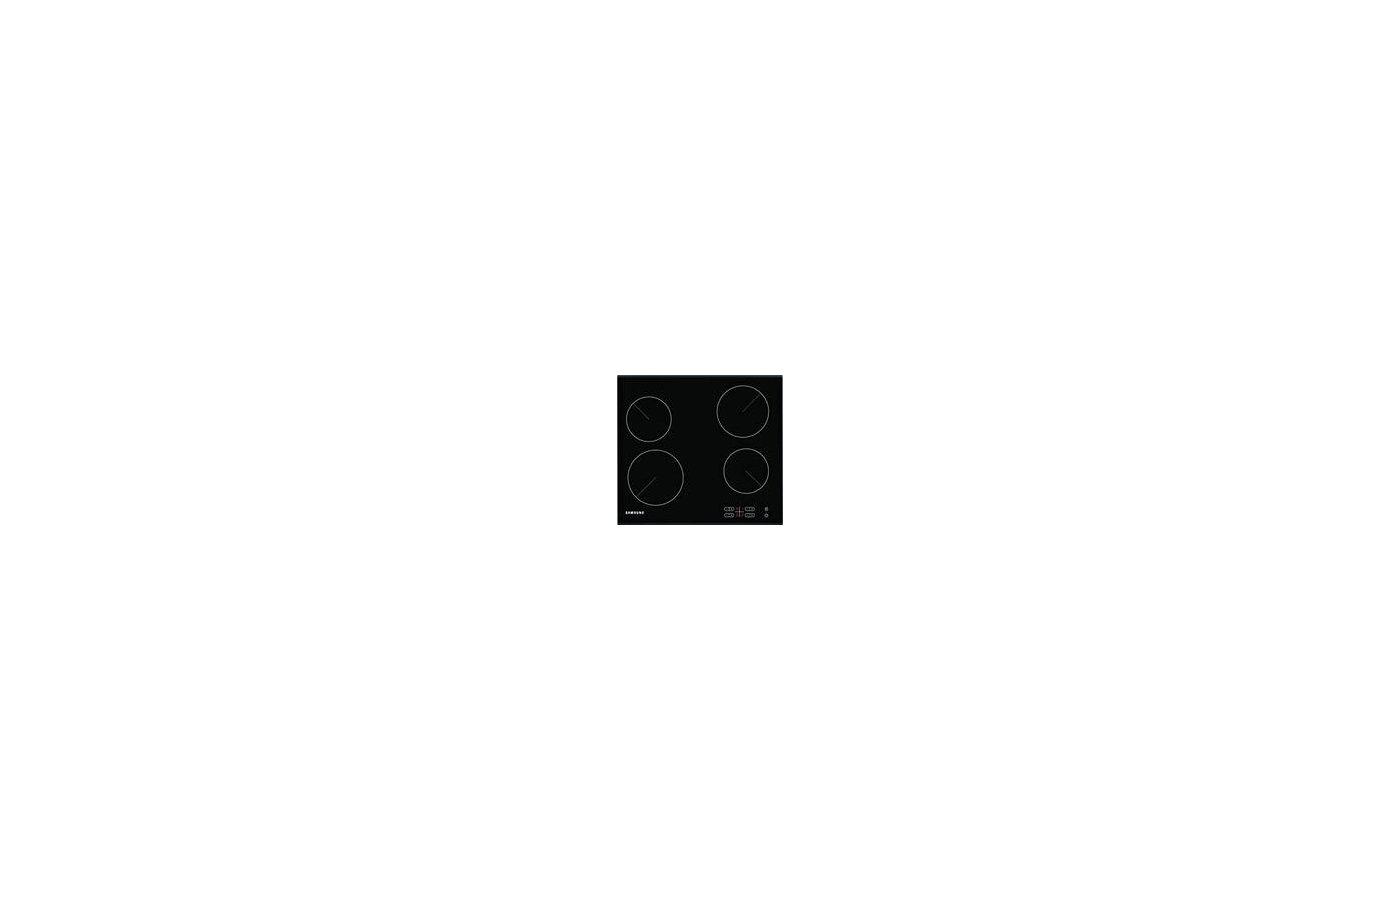 Варочная панель SAMSUNG C61R2AEE